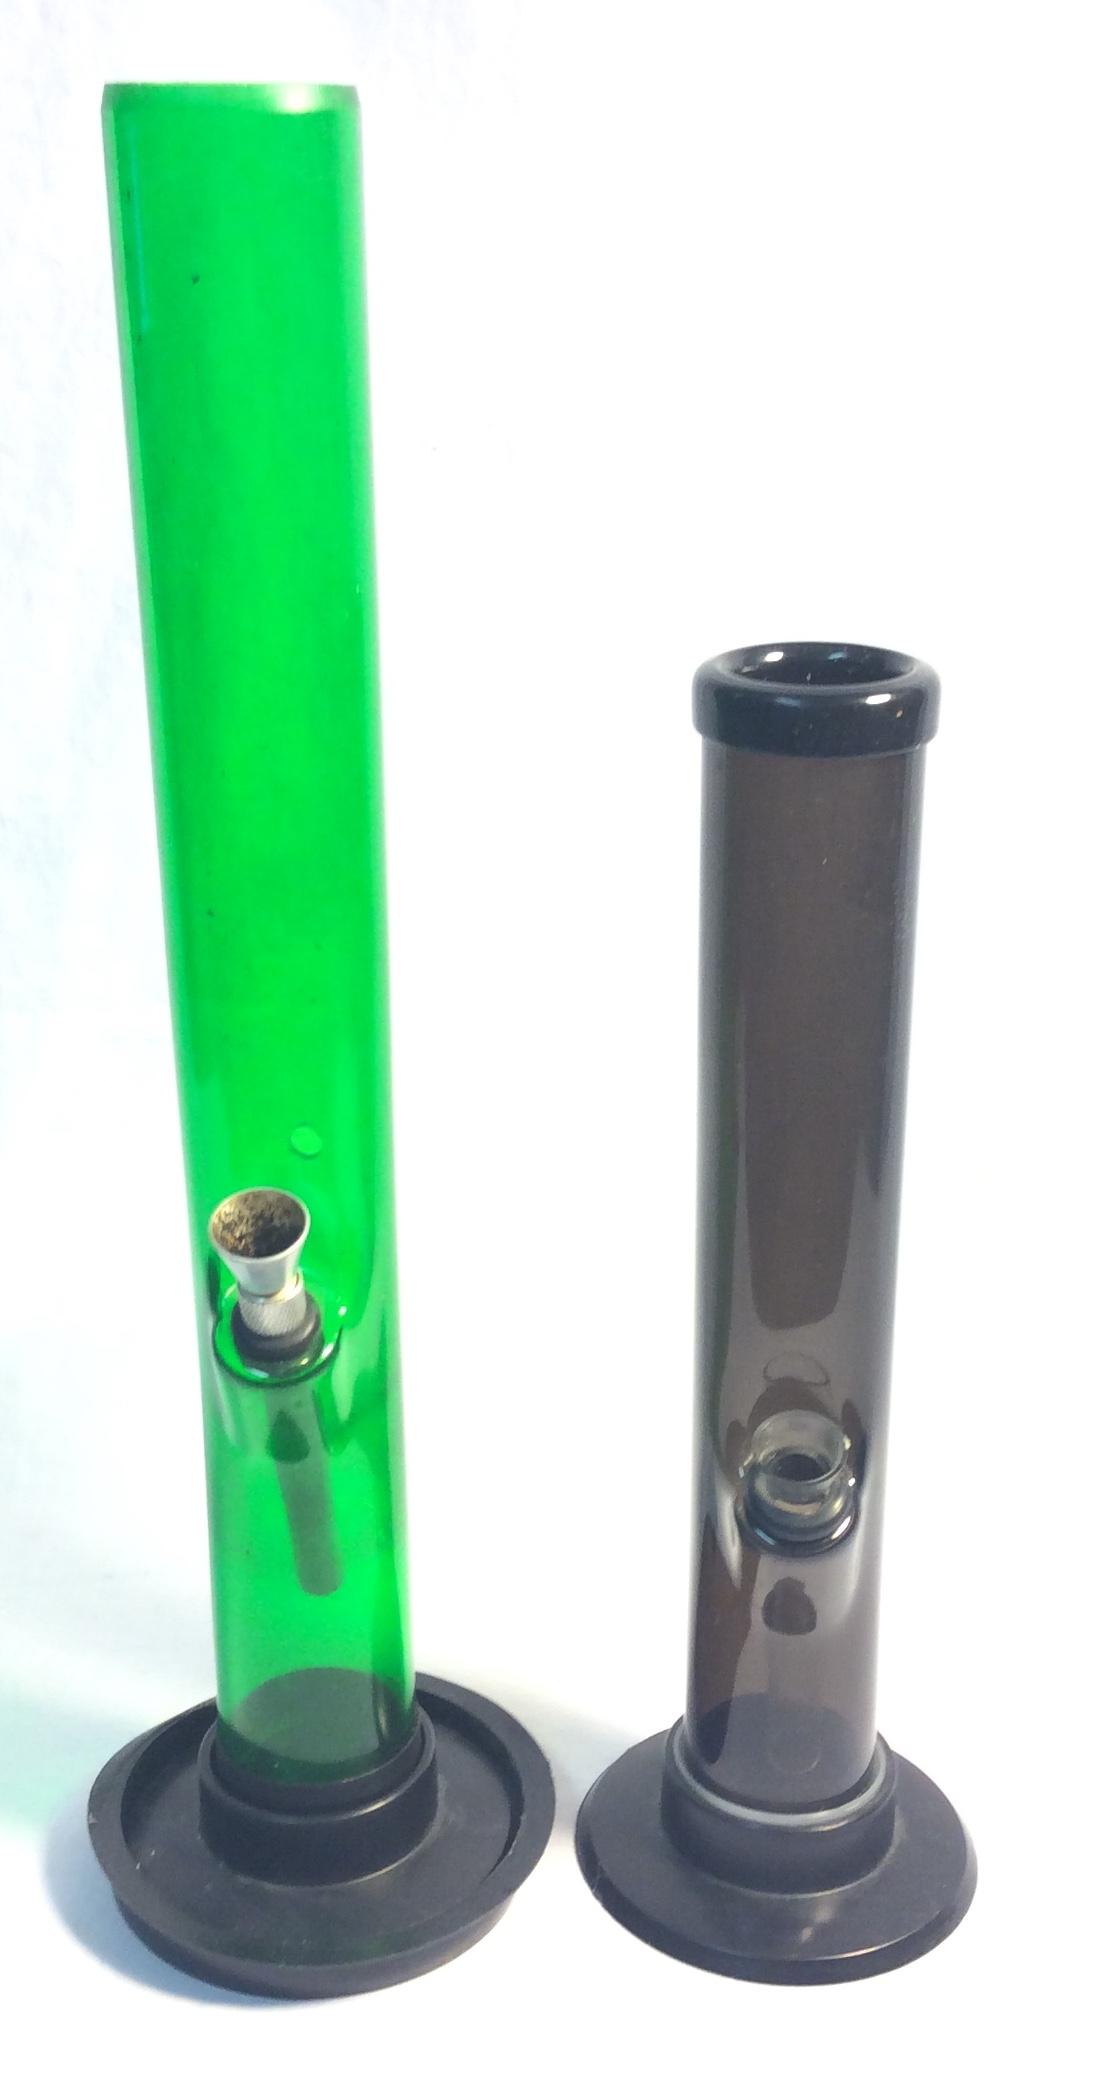 Plastic bongs, x1 green, x1 black